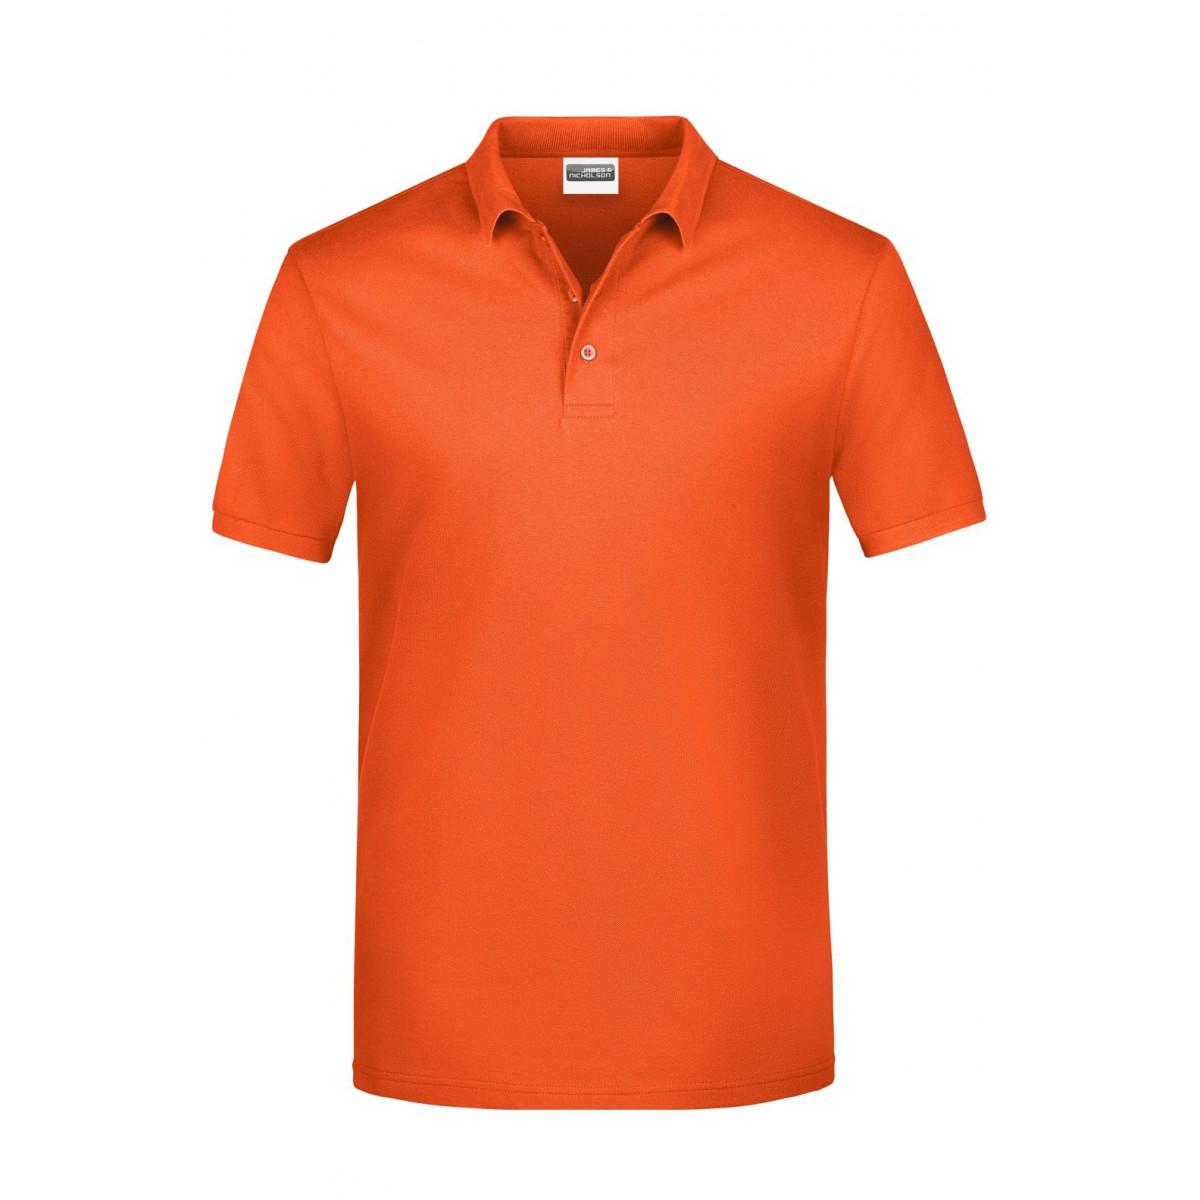 Рубашка поло мужская JN792 Basic Polo Man - Оранжевый